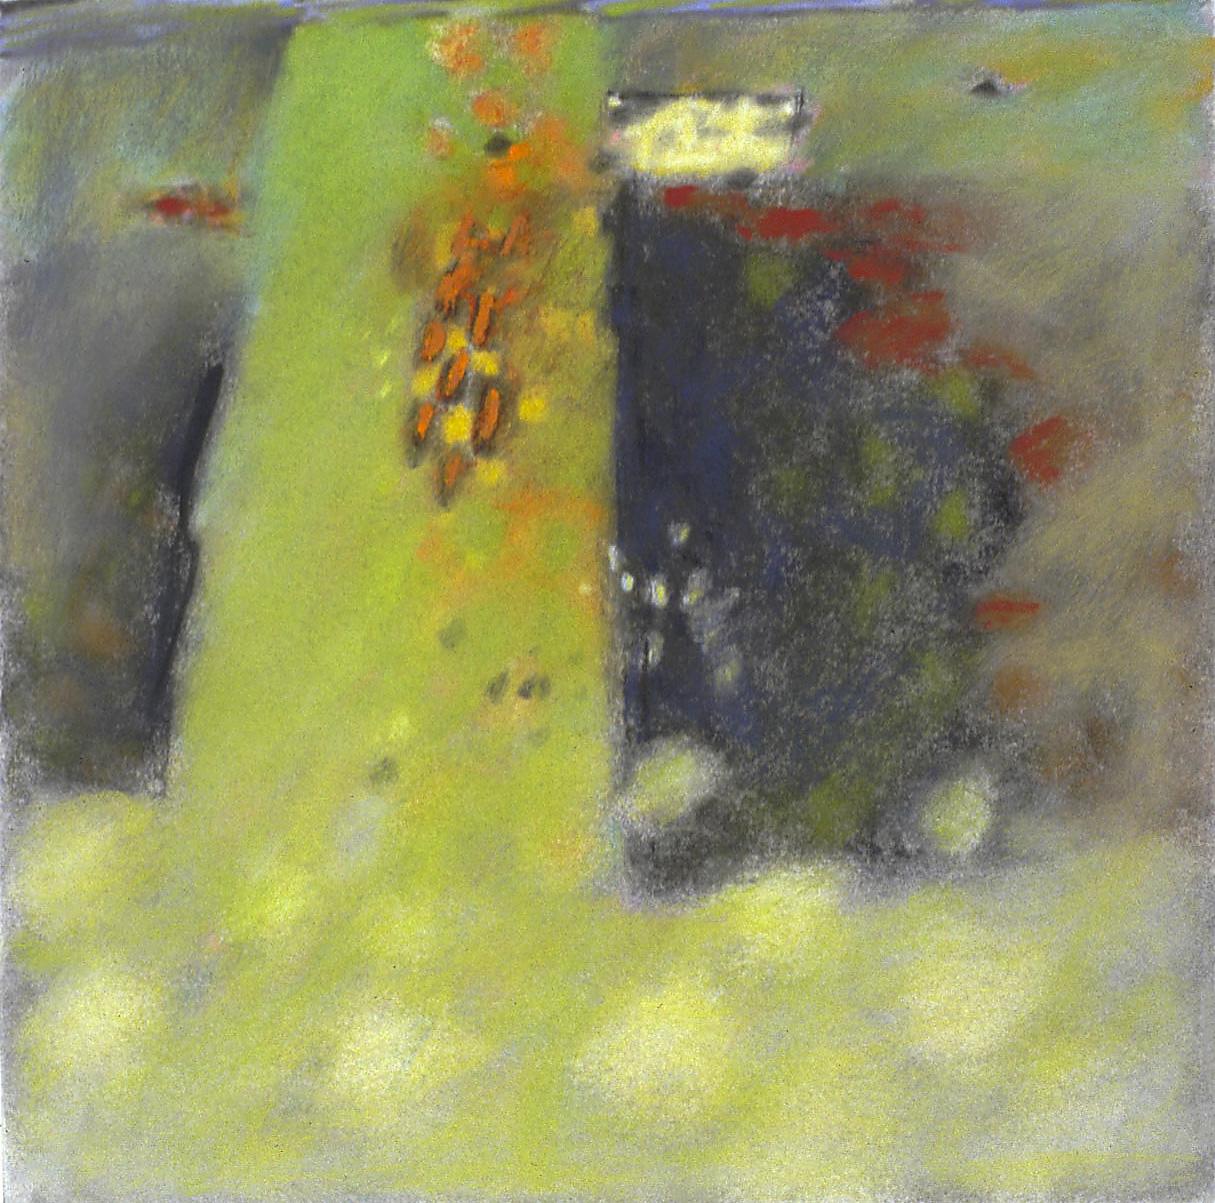 "16-03 | pastel on paper | 14 x 14"" | 2003"